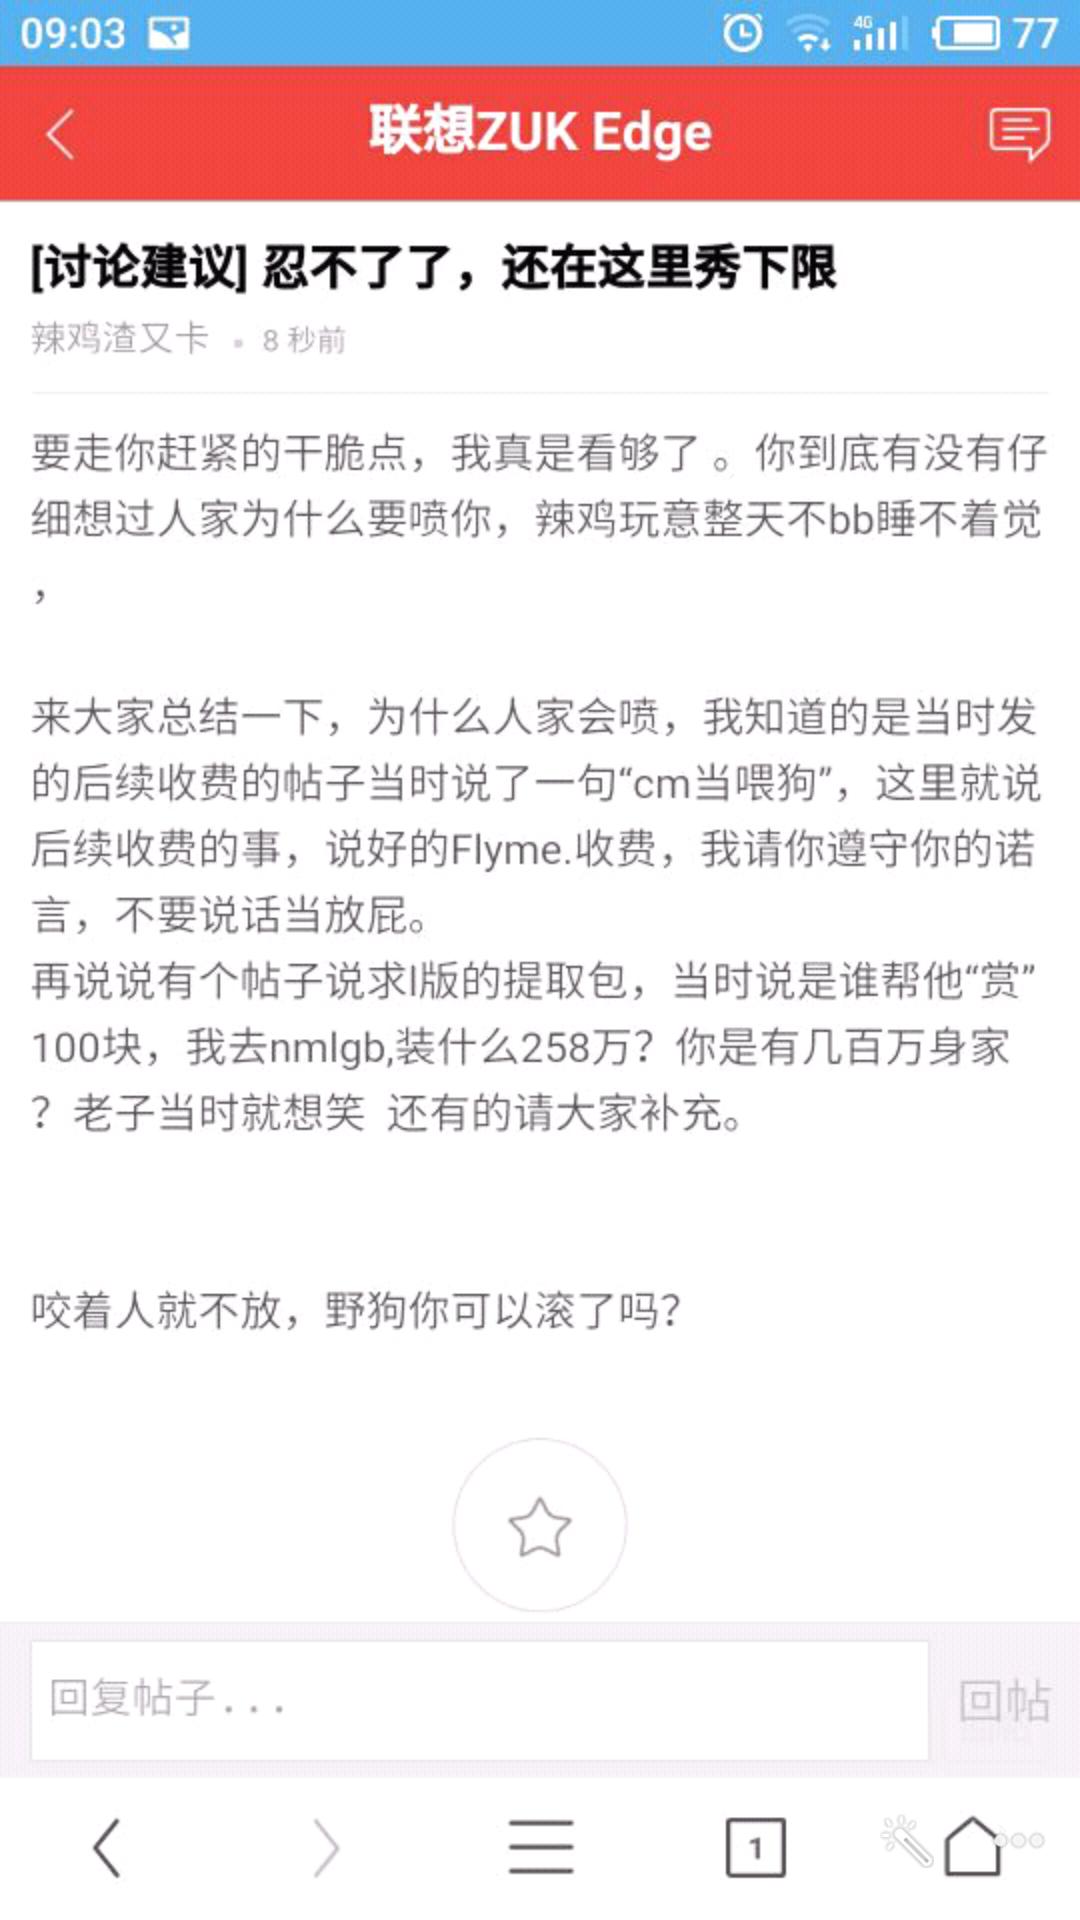 Screenshot_2017-07-09-01-07-09-298_com.tencent.mobileqq.png